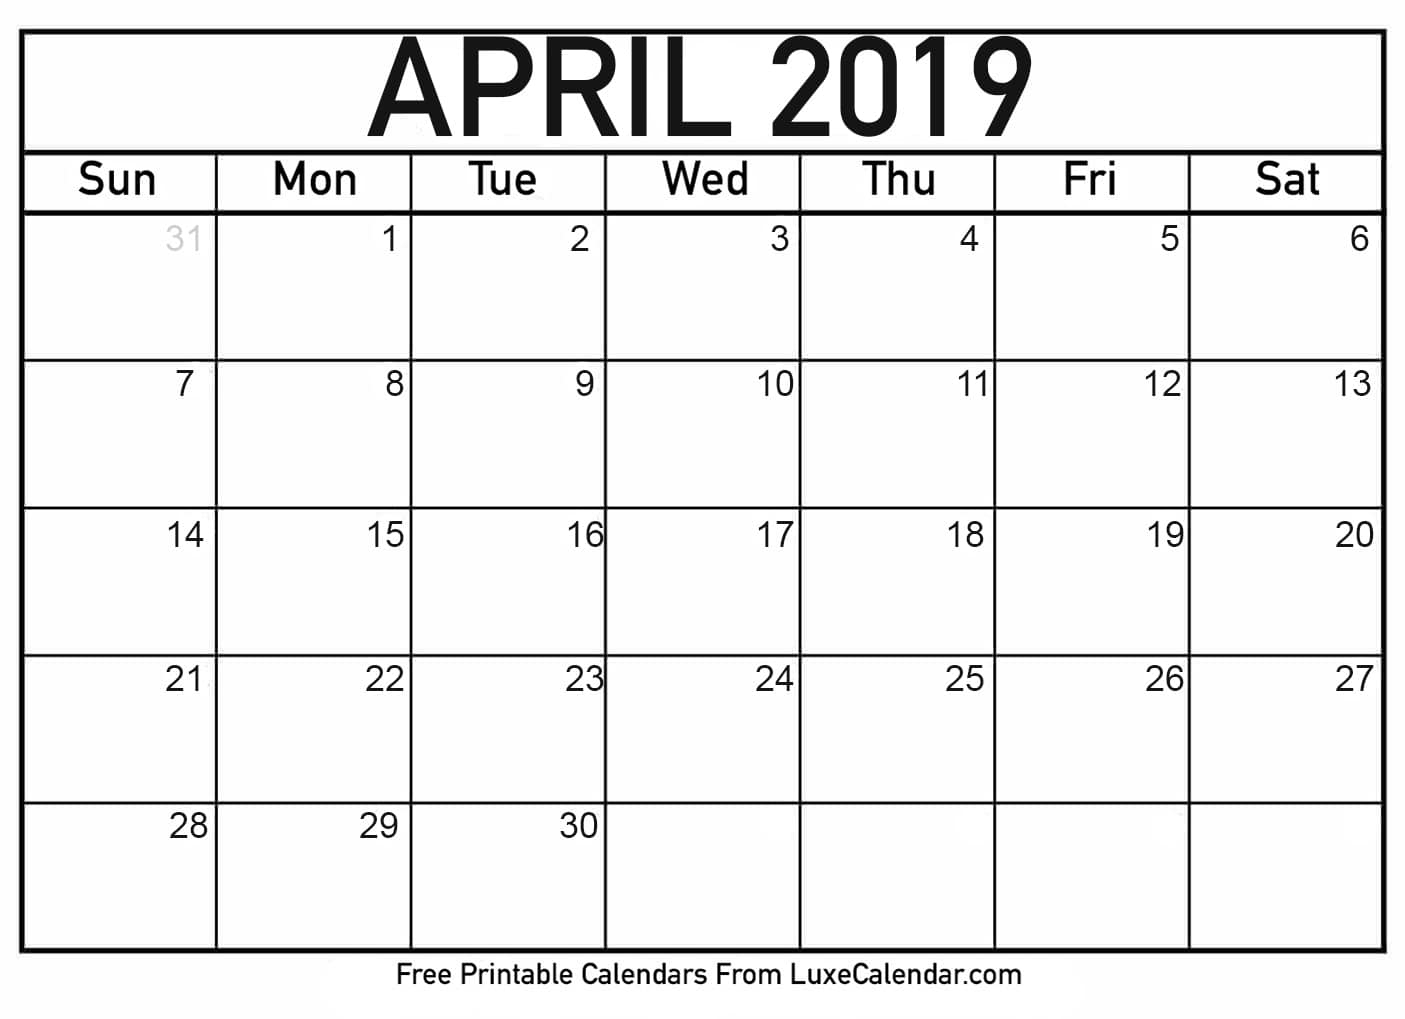 April 2019 Calendar Word - Printable Calendar 2019| Blank